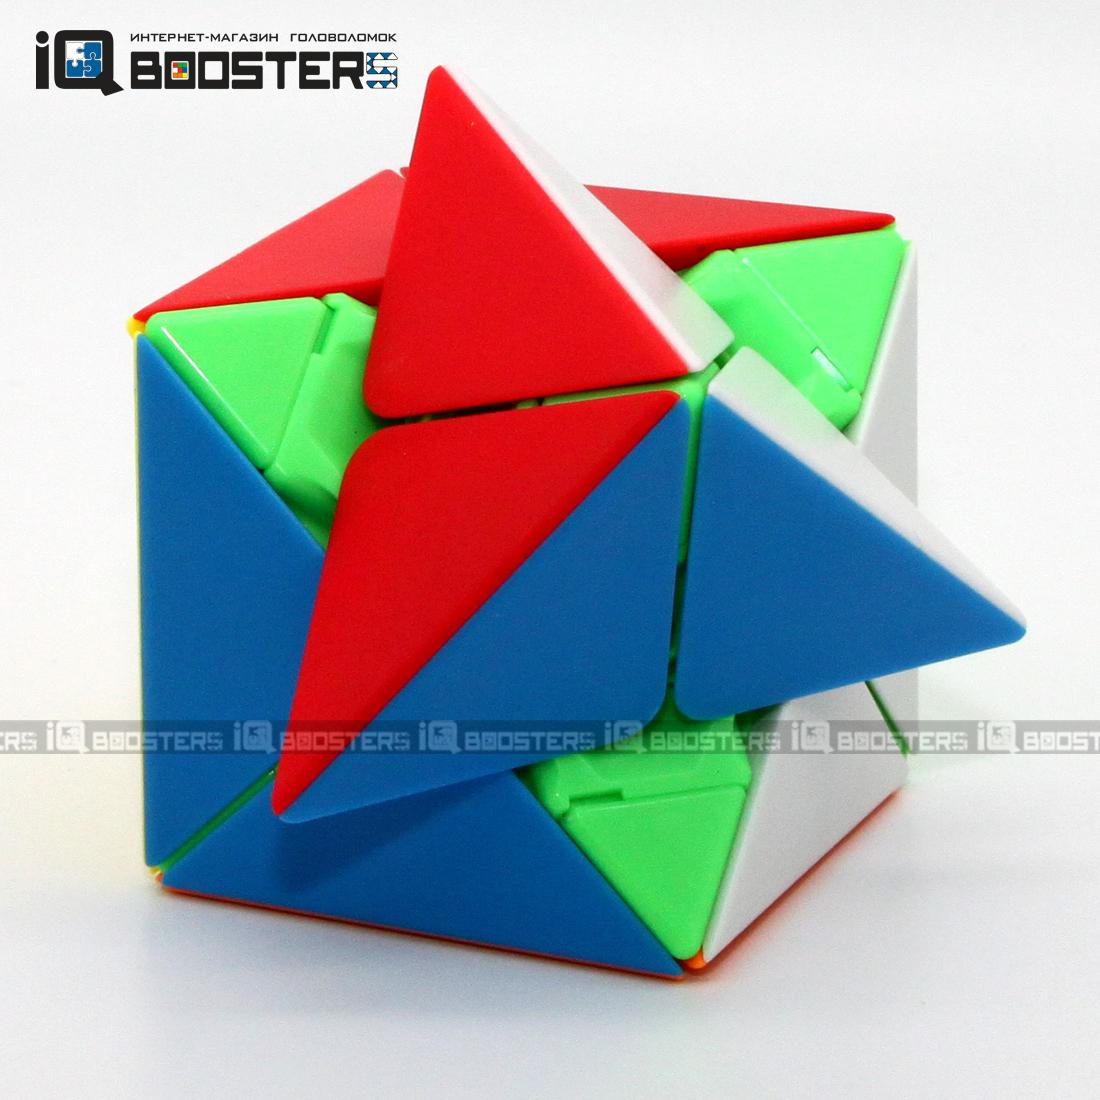 ss_dino_cube_3